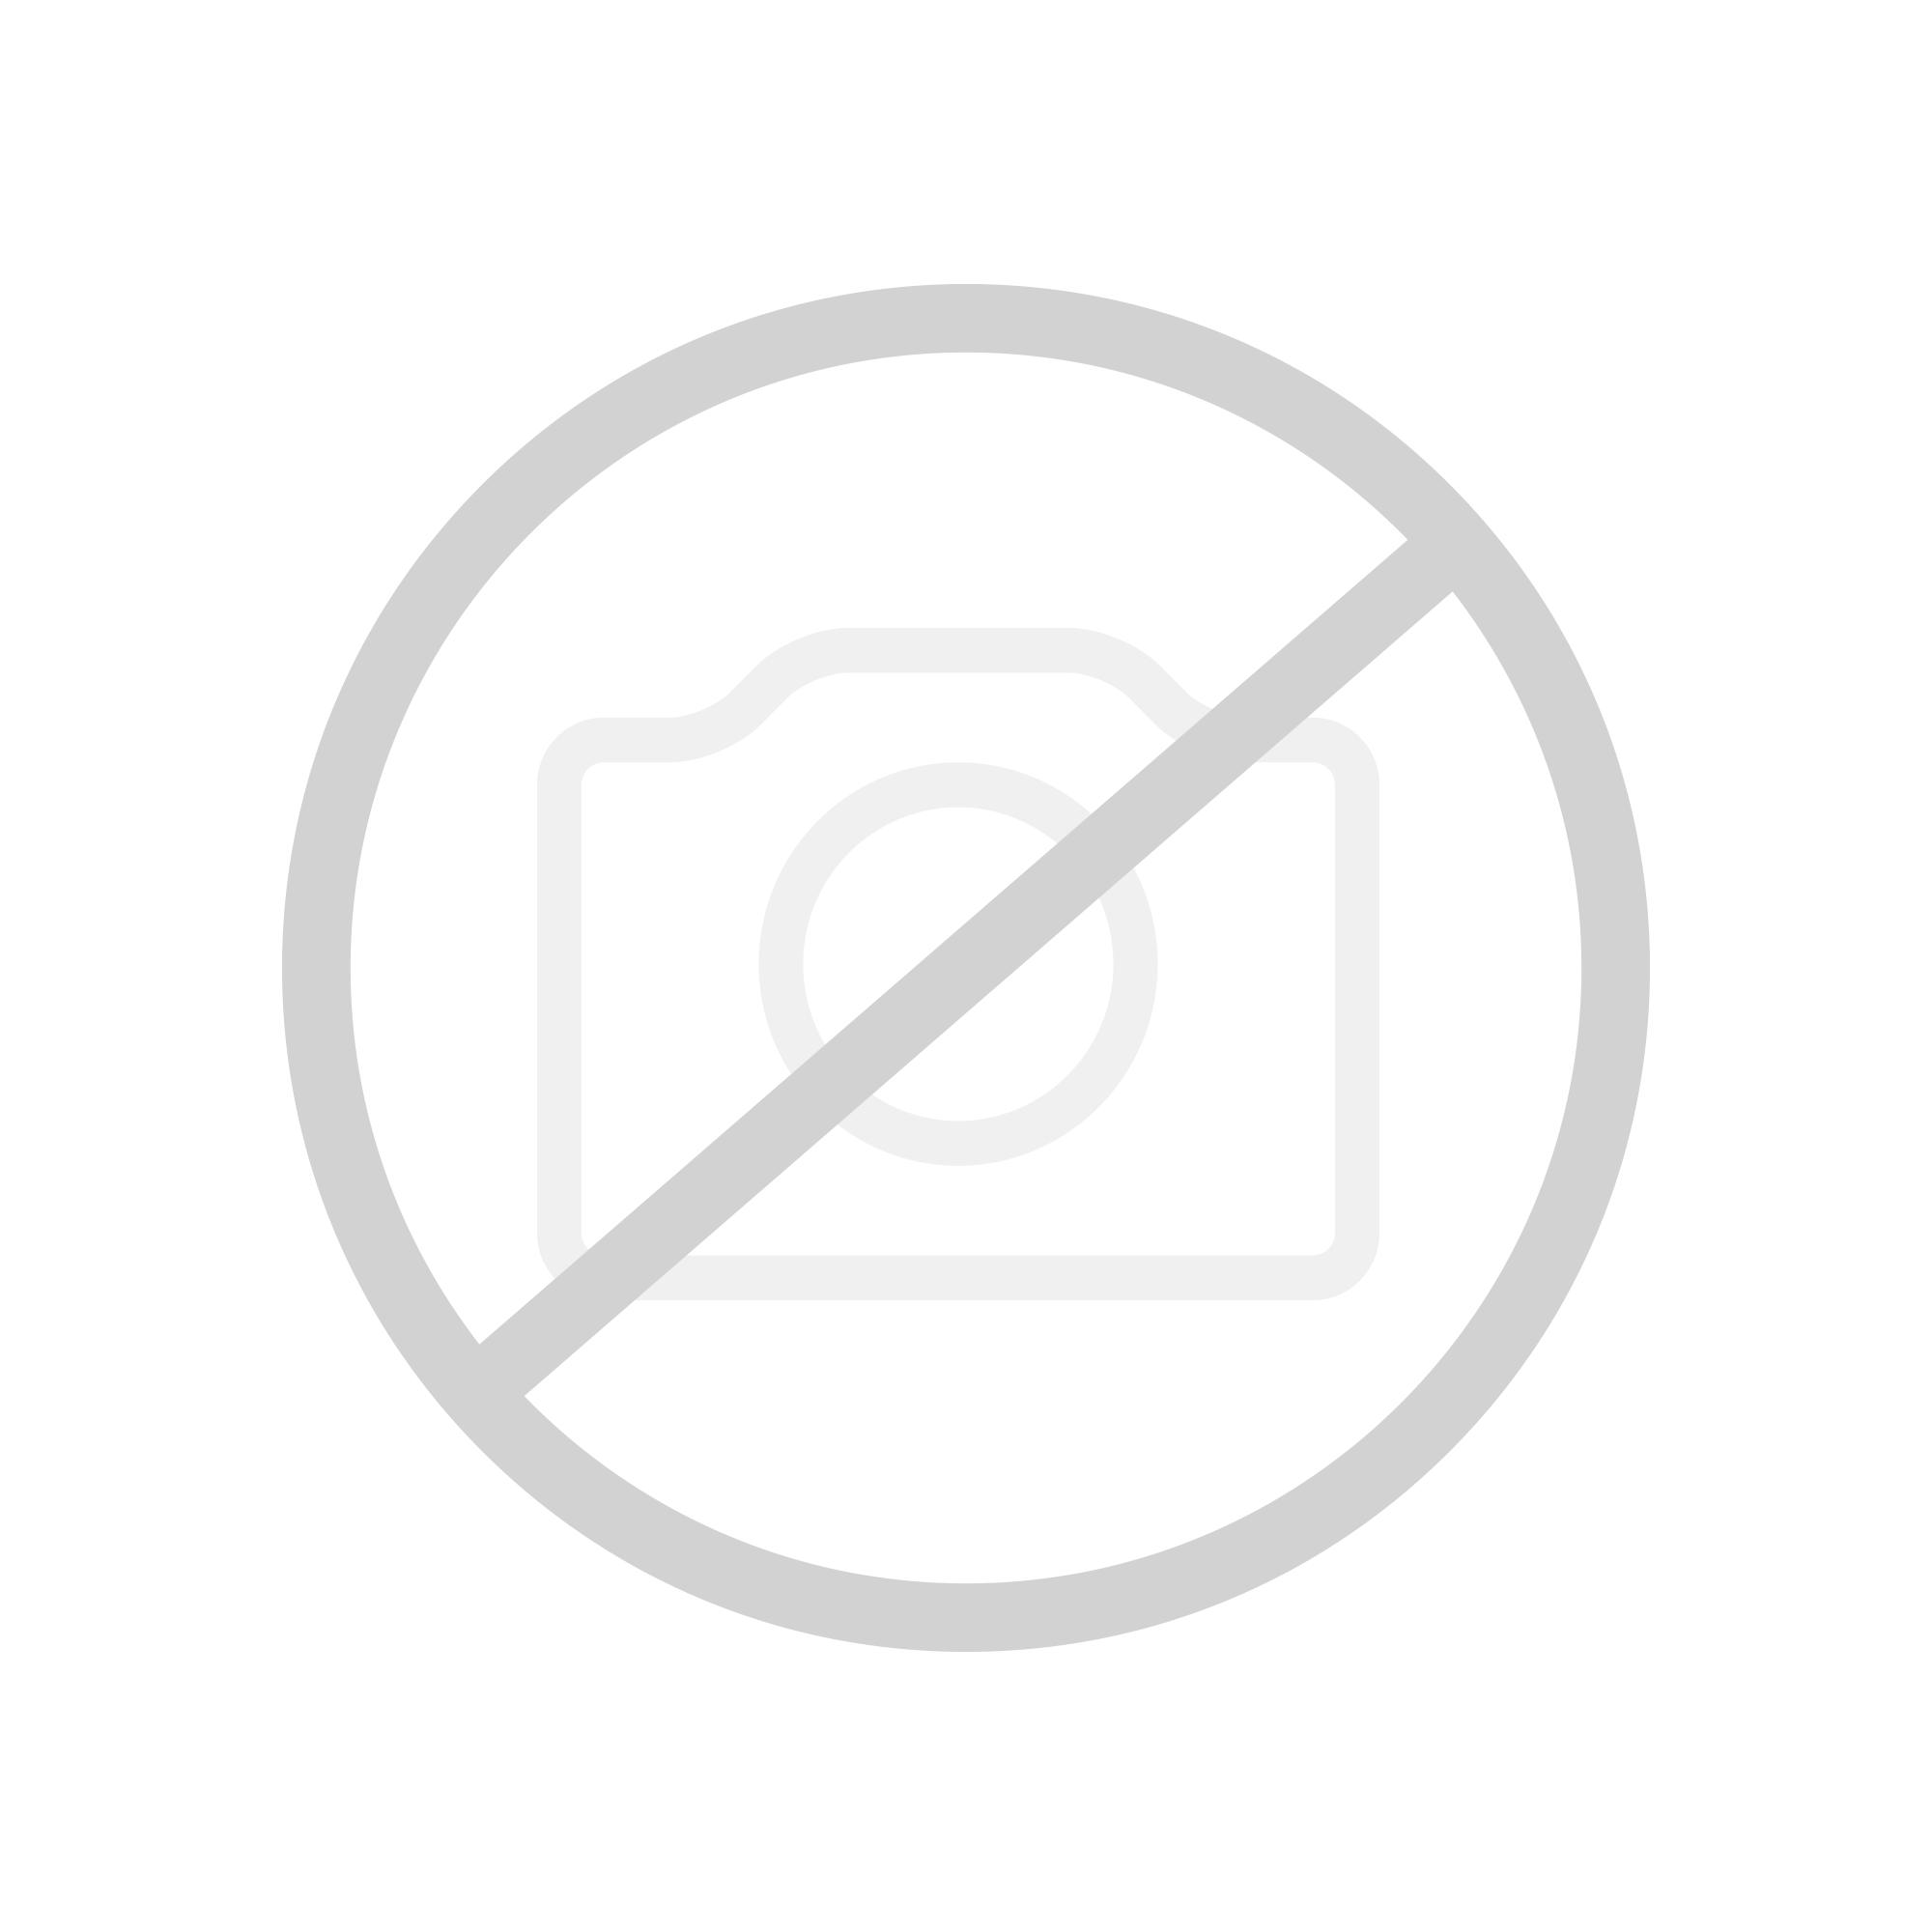 Clage Durchlauferhitzer elektronisch gesteuert DCX 13. EEK: A